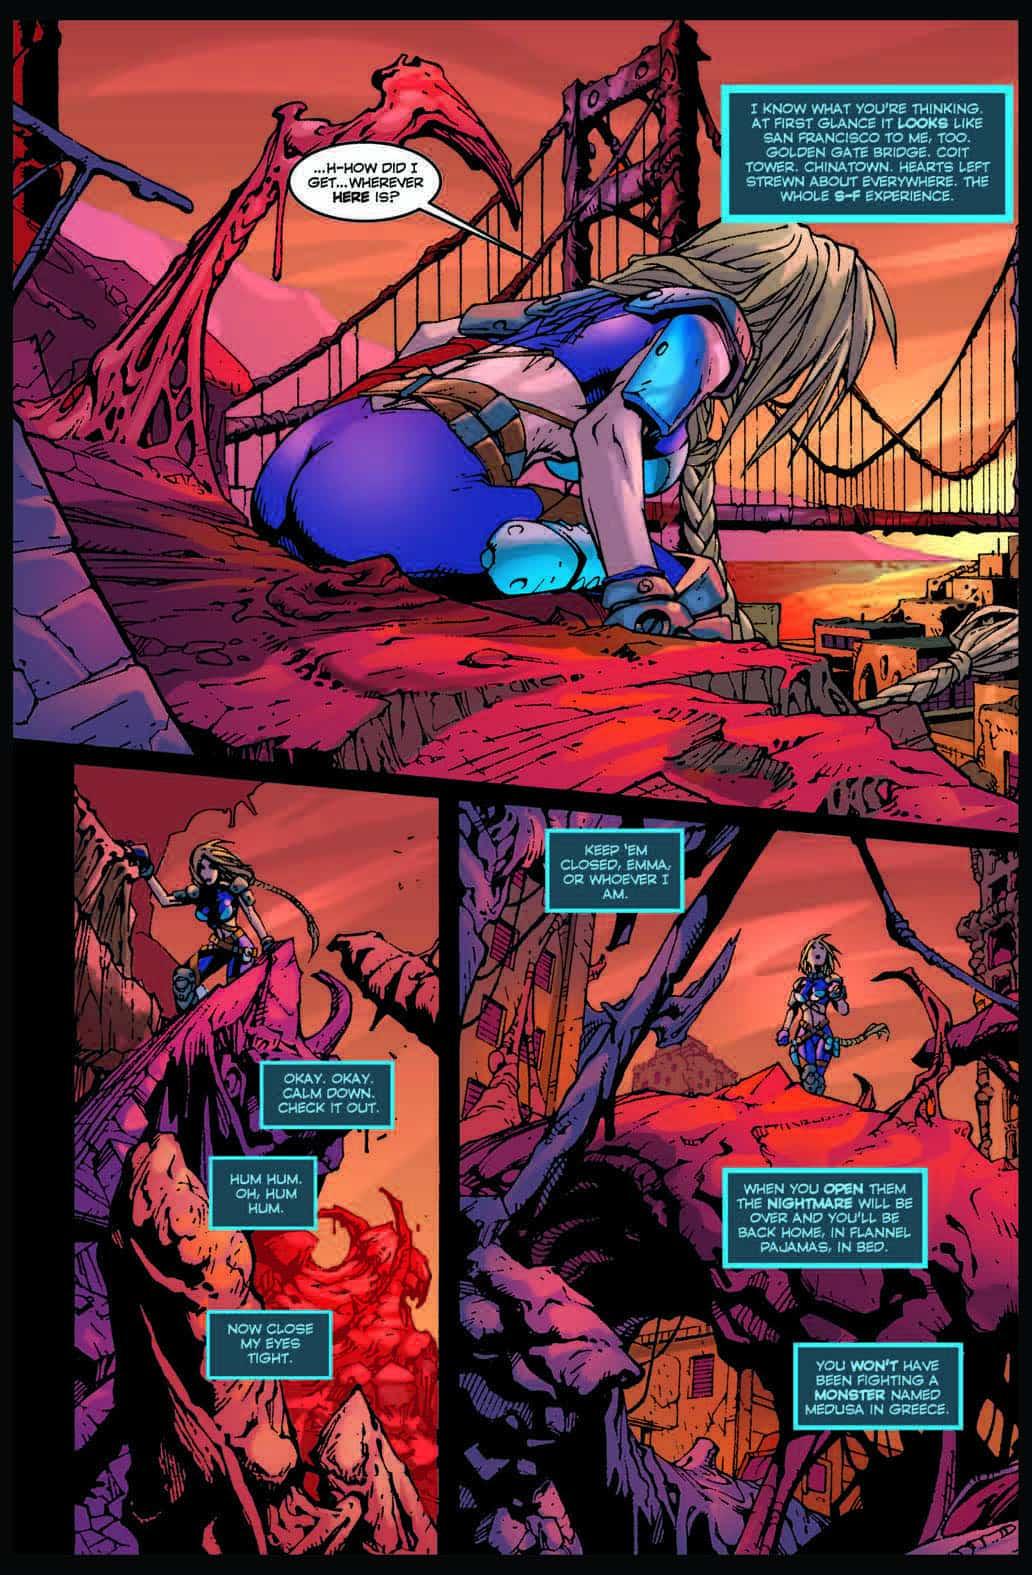 10th-Muse-Vol-2-the-Image-Comics-Run-Part-2-Image-02